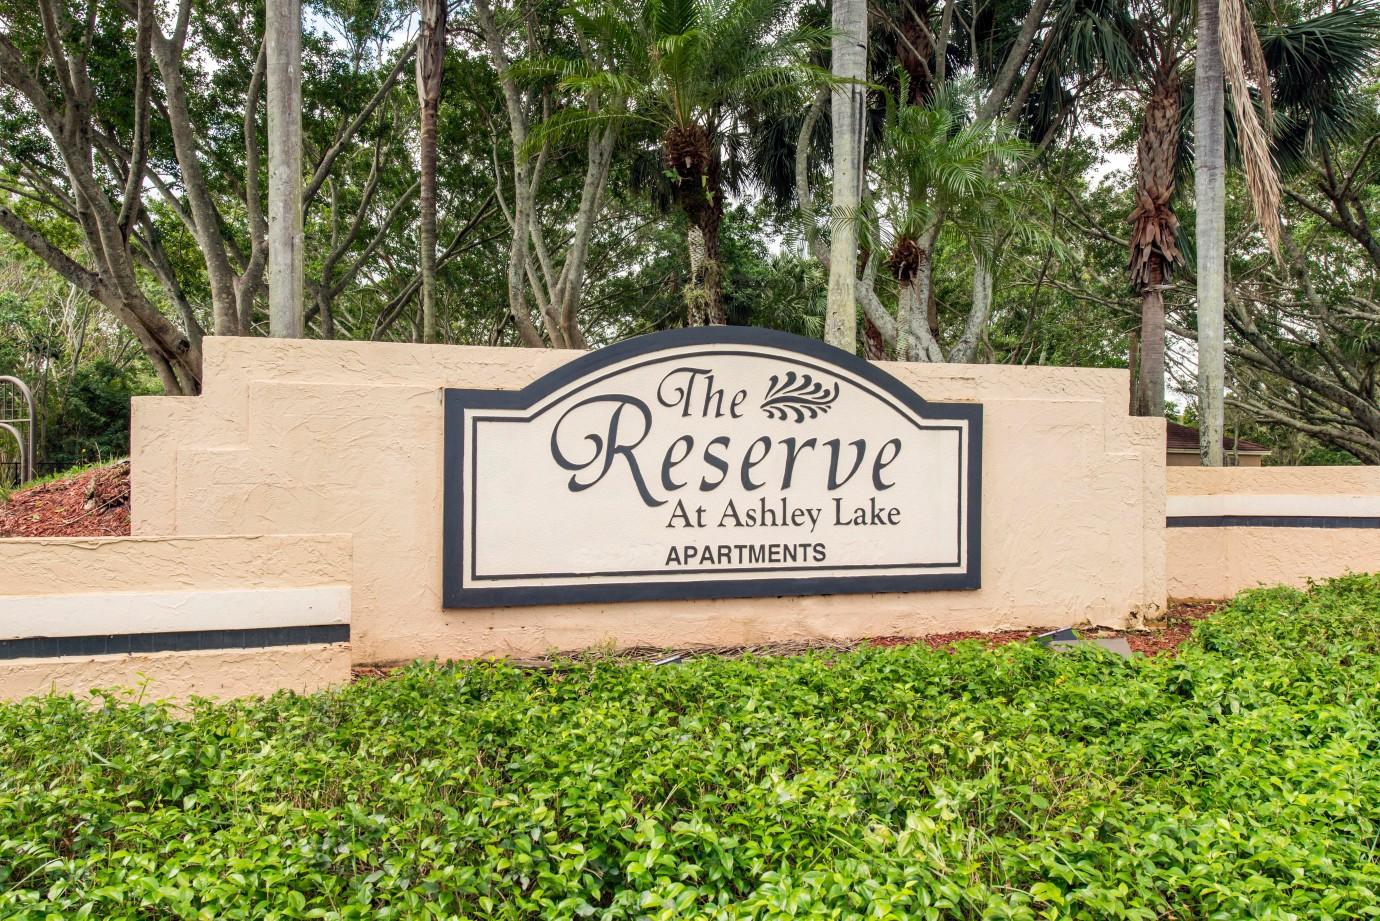 The Reserve at Ashley Lake Apartments